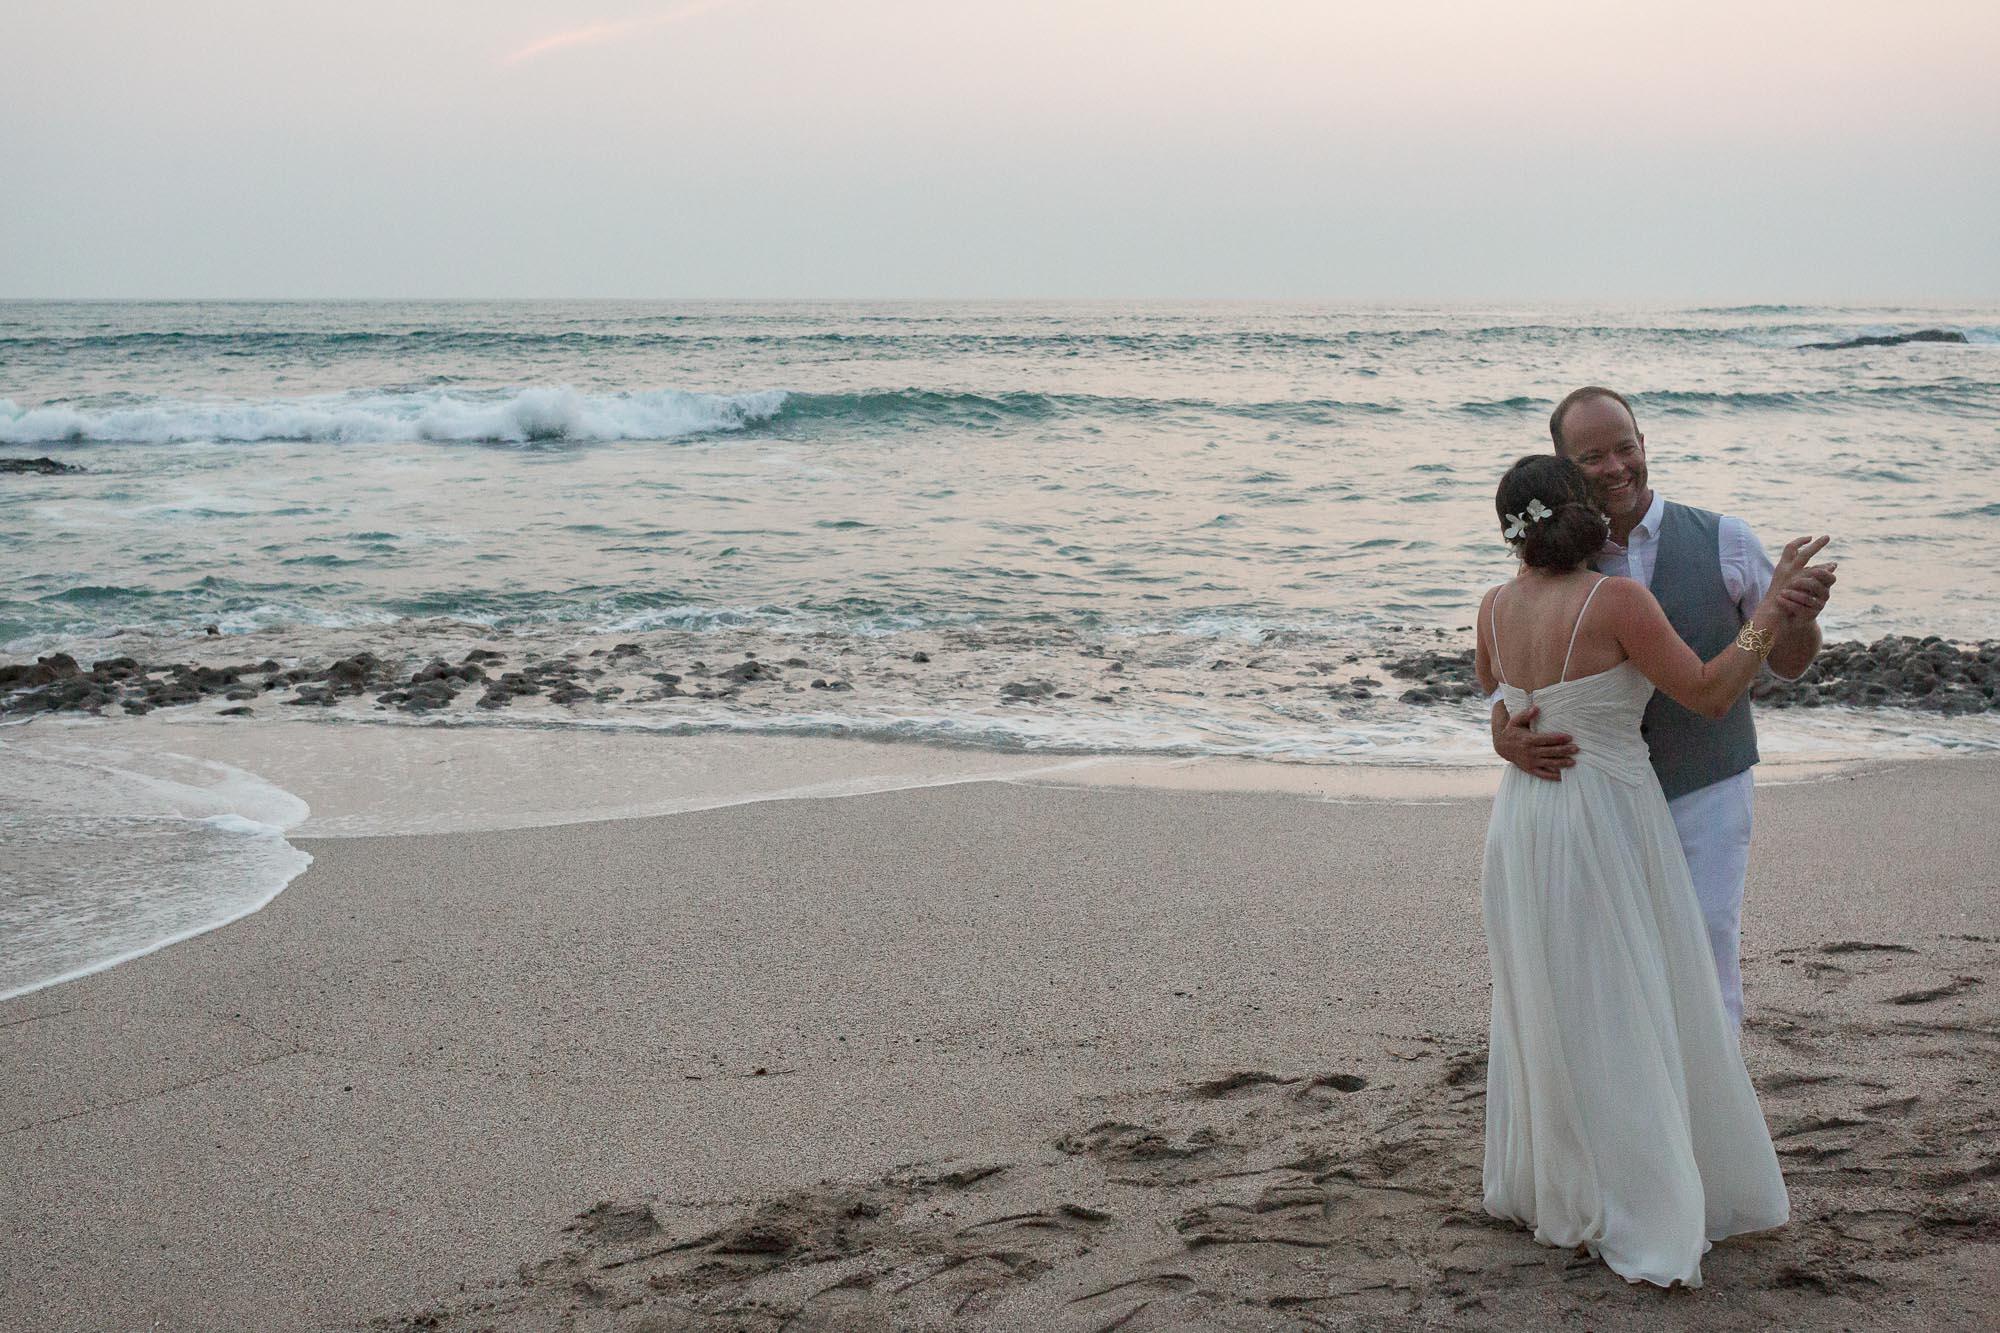 Slow dancing on the beach wedding-on-the-beach-Costa-Rica